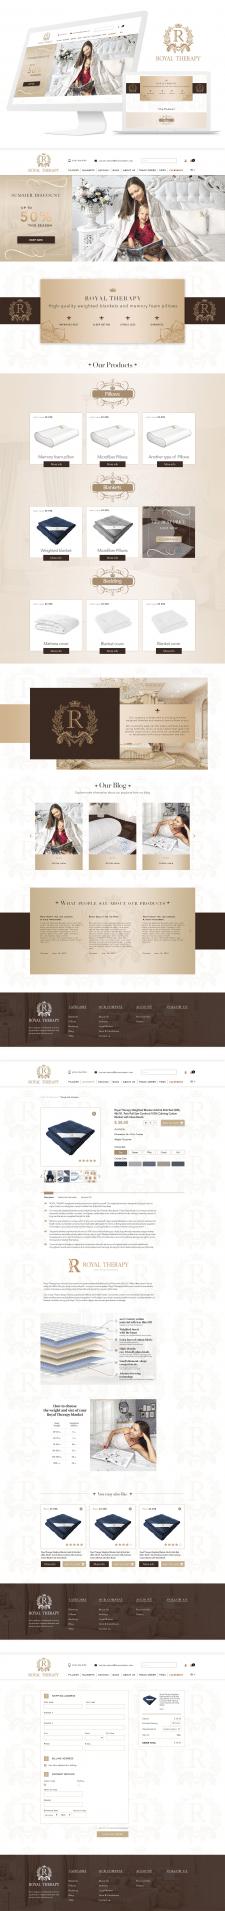 Дизайн сайта для Royal Therapy